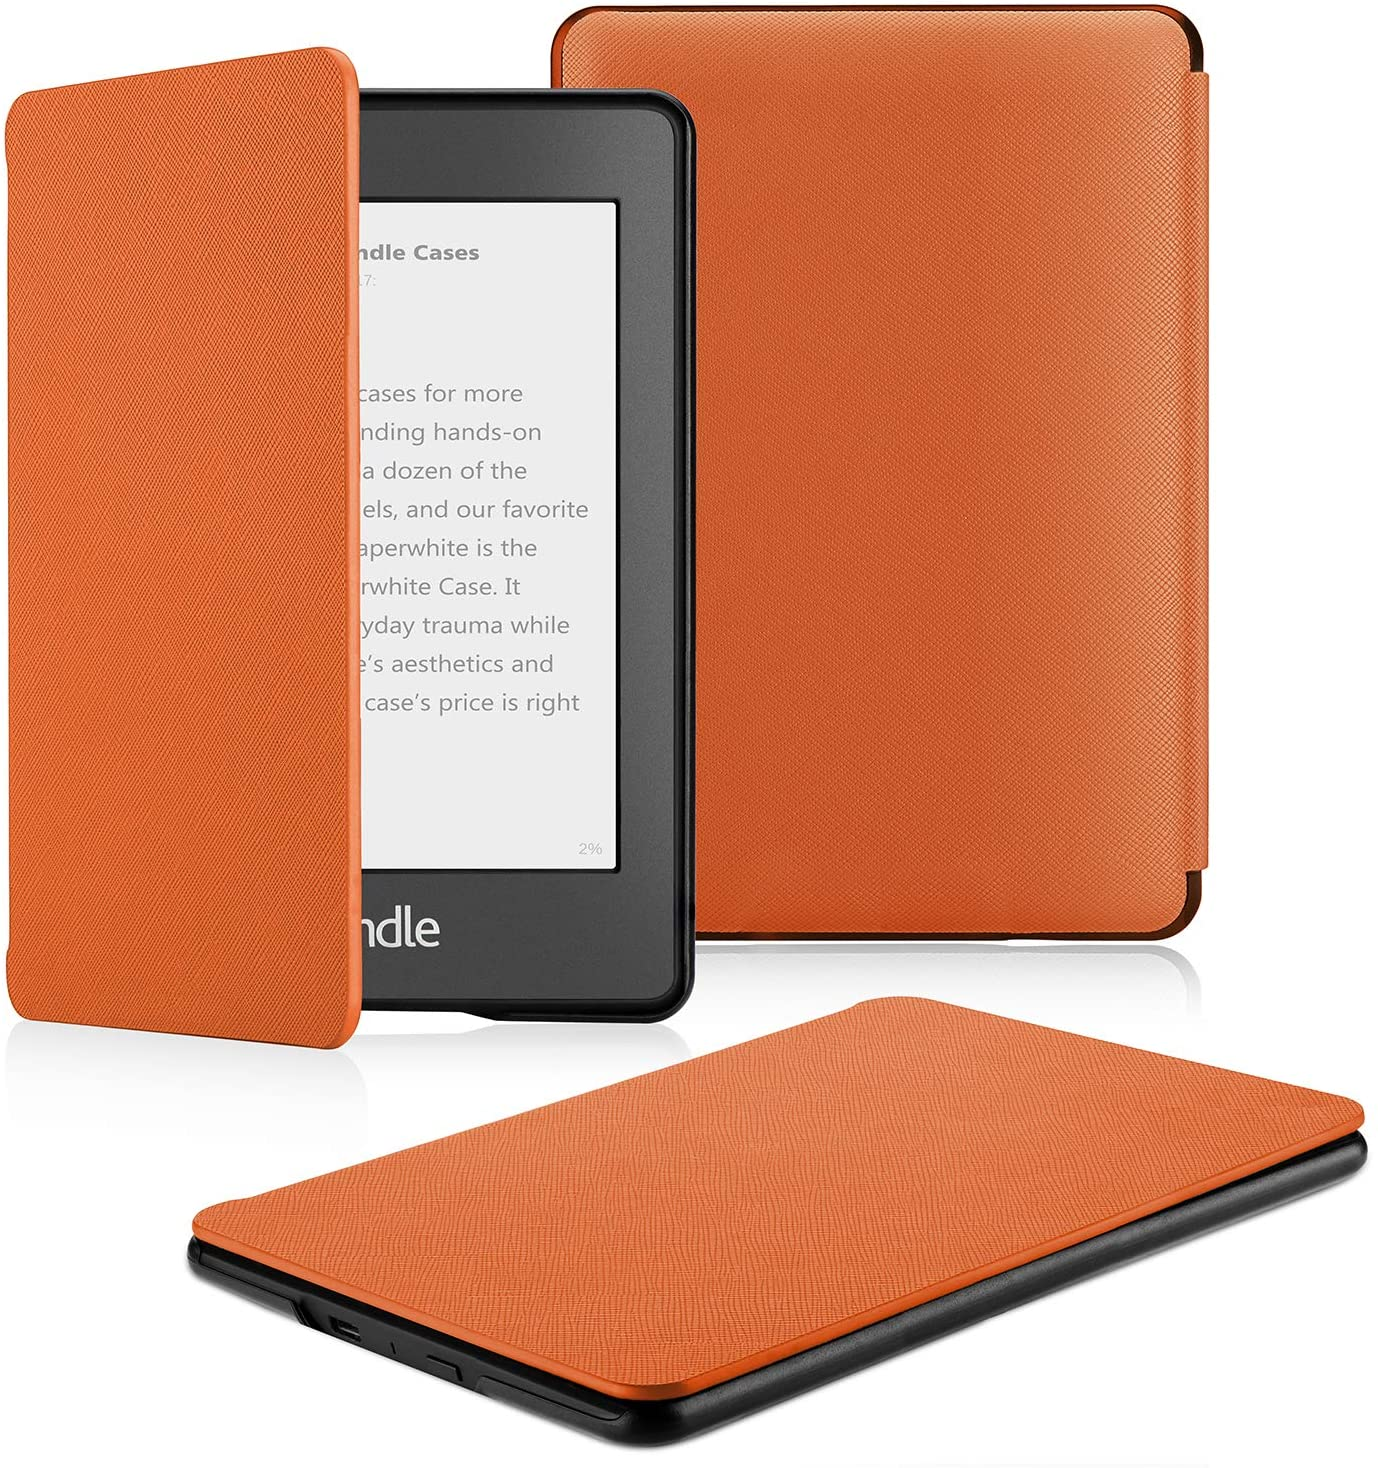 Las mejores fundas para Kindle Paperwhite